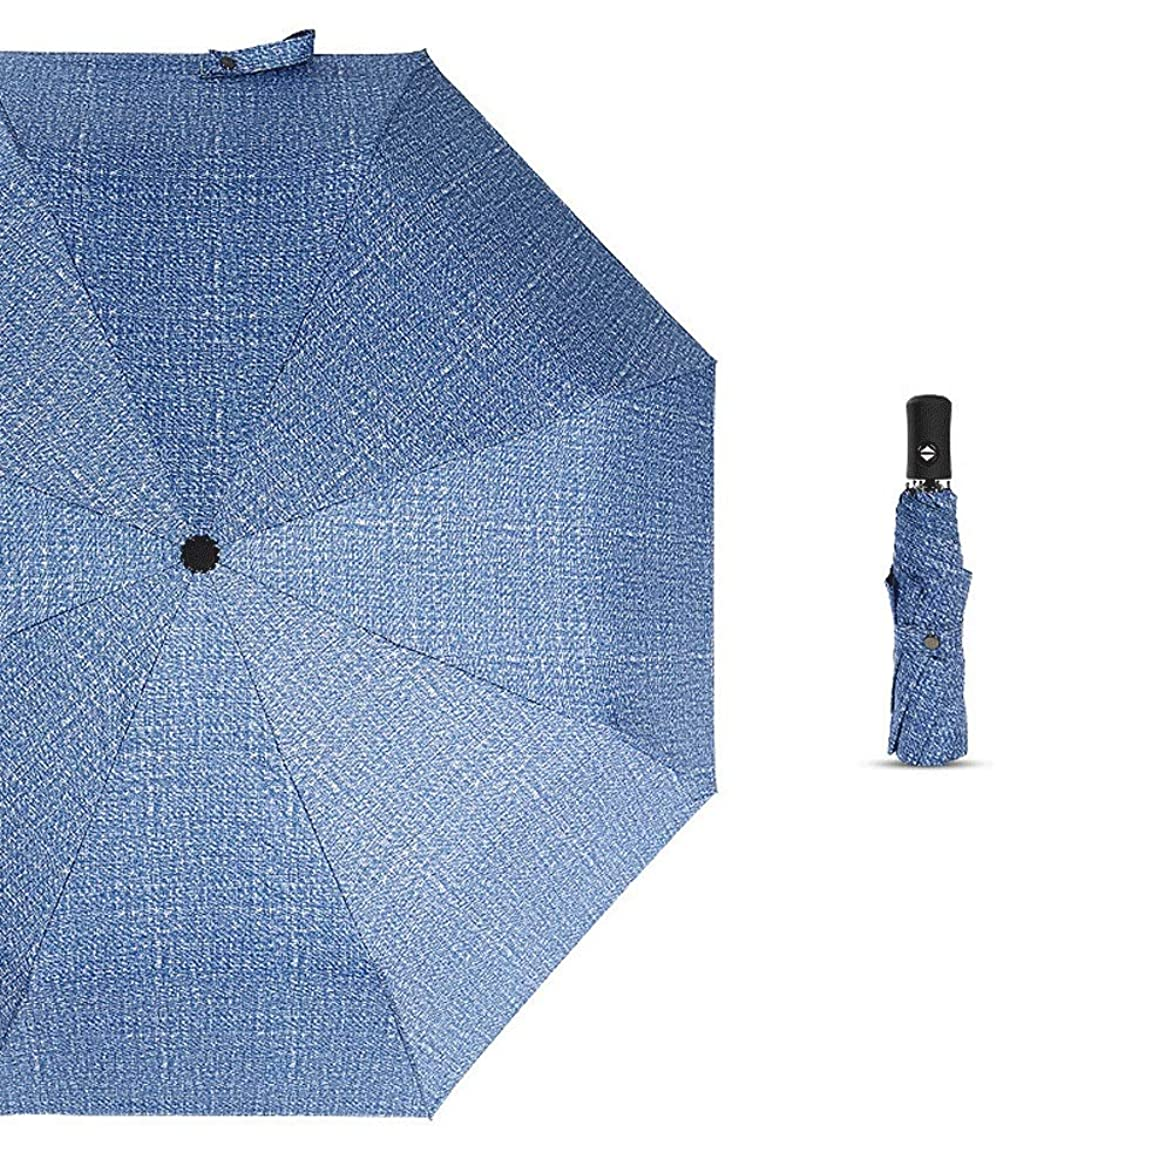 AZZ Fully Automatic Small Folding Umbrella,Compact Folding Lamp Portable Sun Protection Rain Outdoor Golf Umbrella,Female Men's Children (Color : Blue)